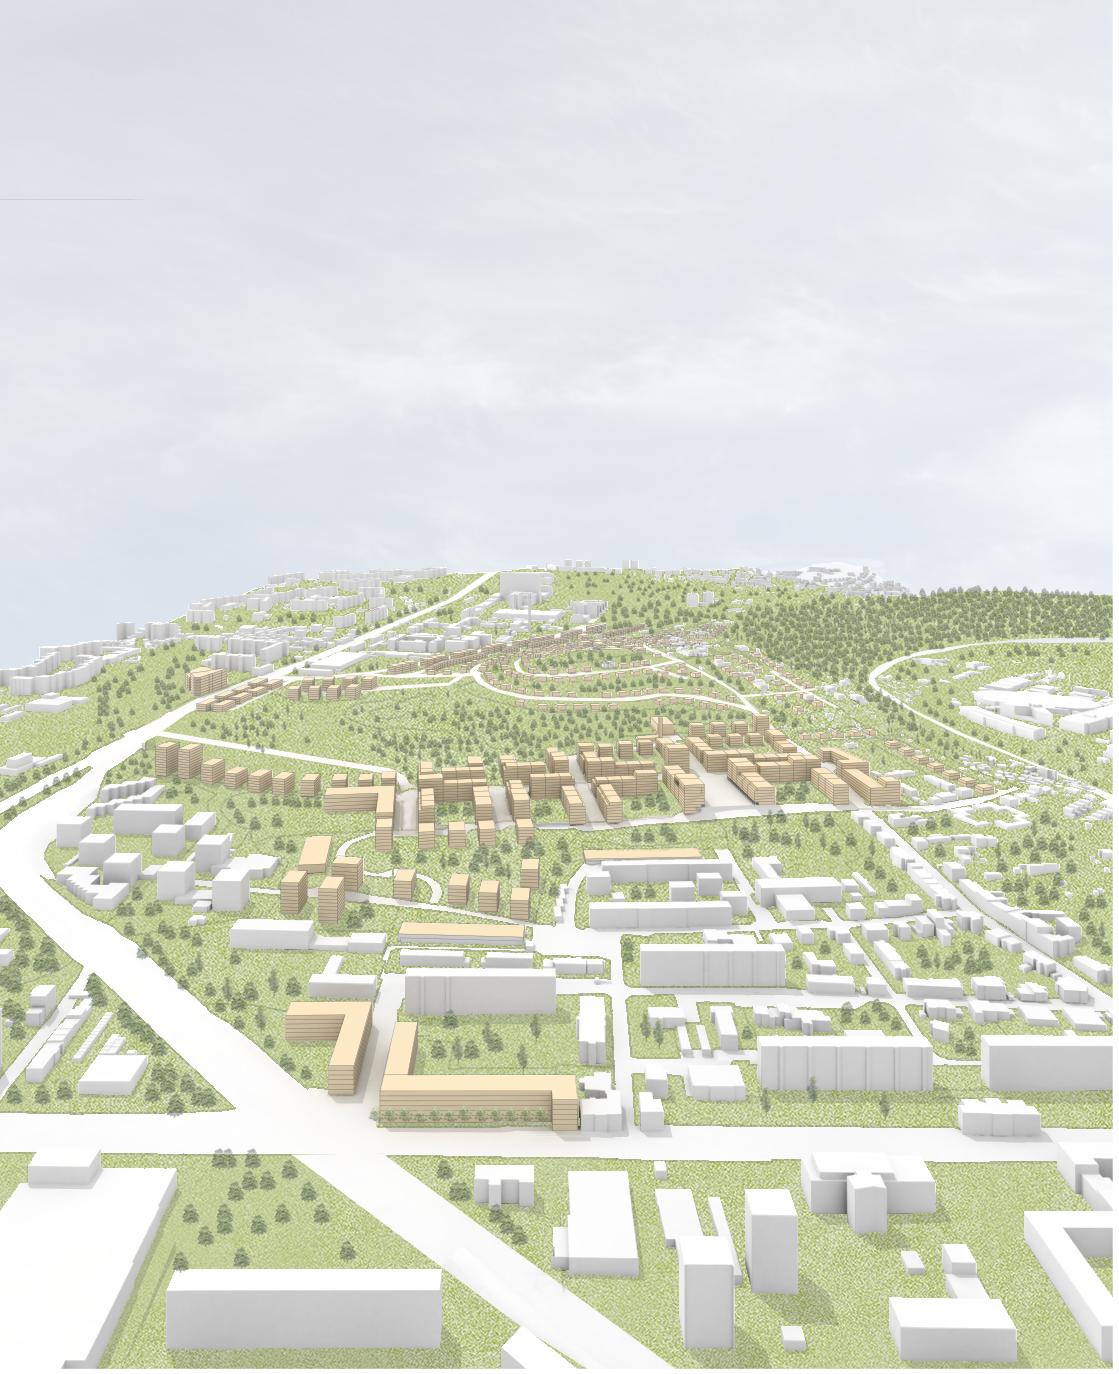 Územní studie Červený kopec, Brno